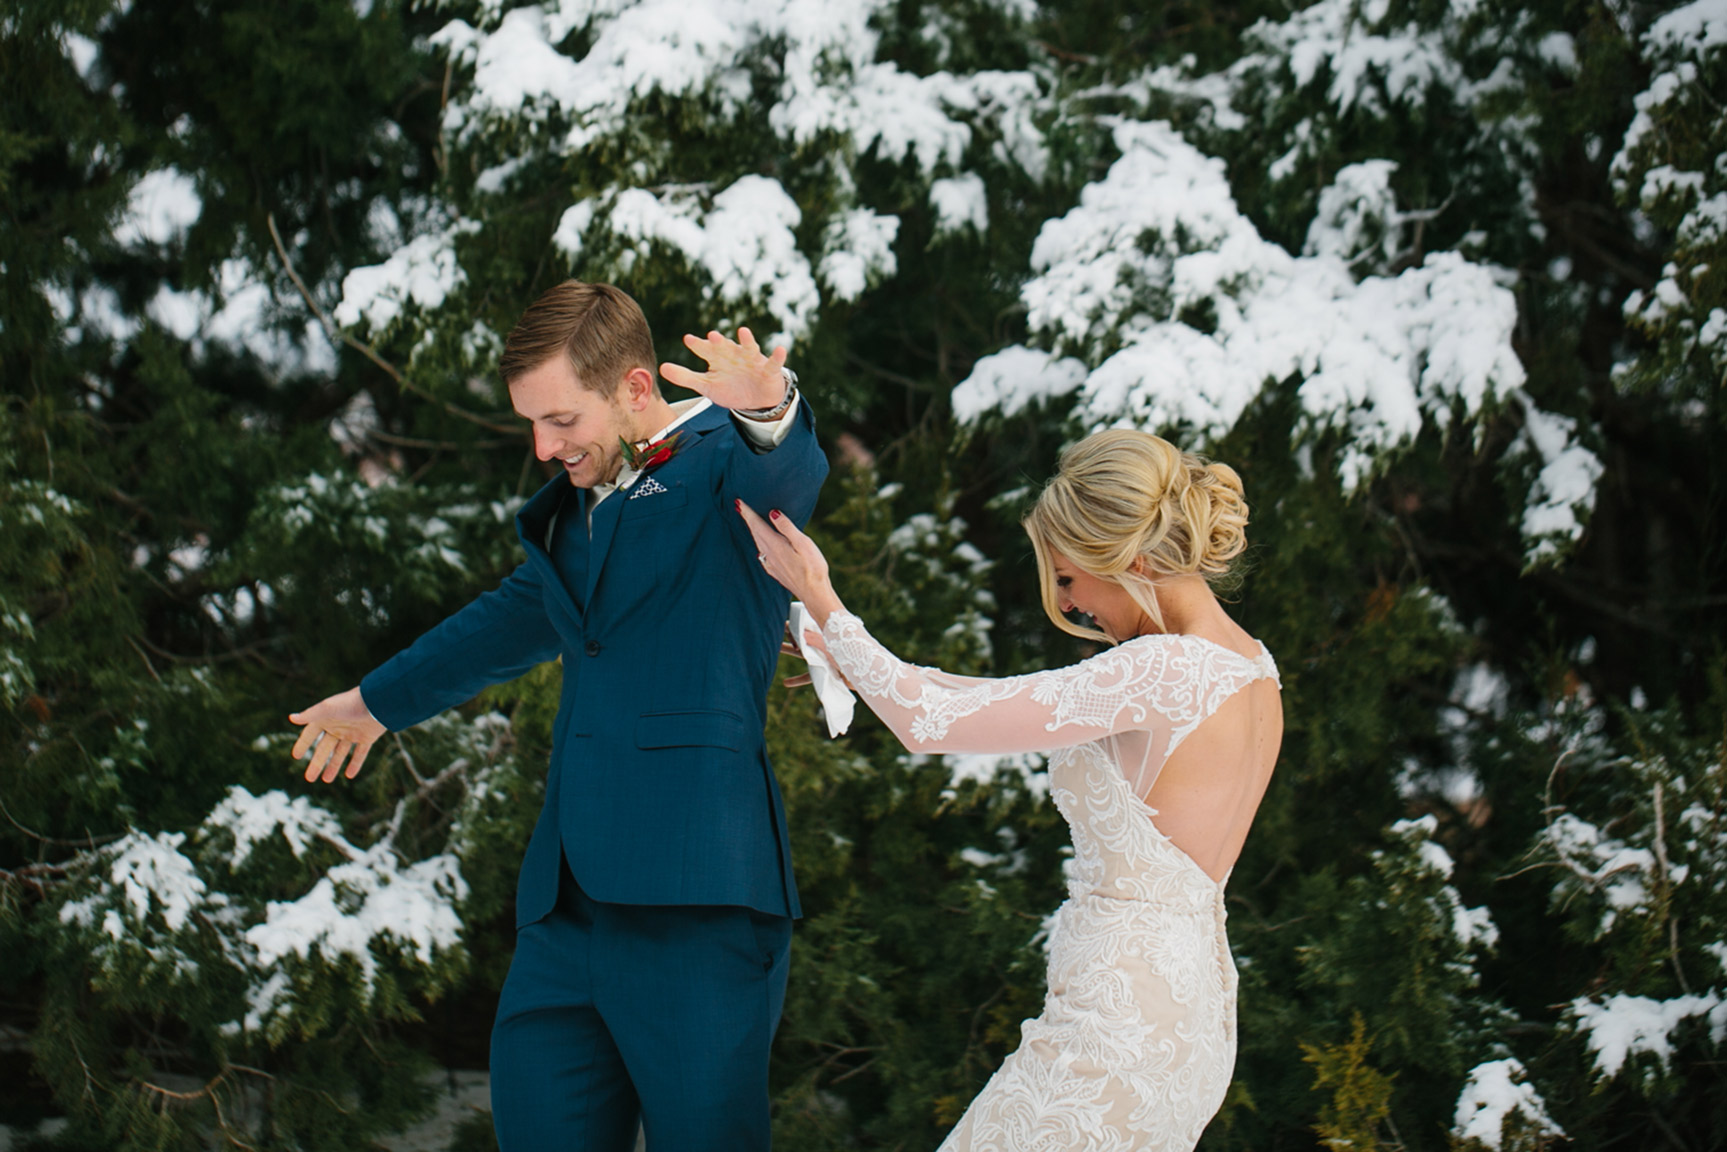 Cotton_Creek_Barn_Winter_Wedding_WeddingPhotographer021.jpg